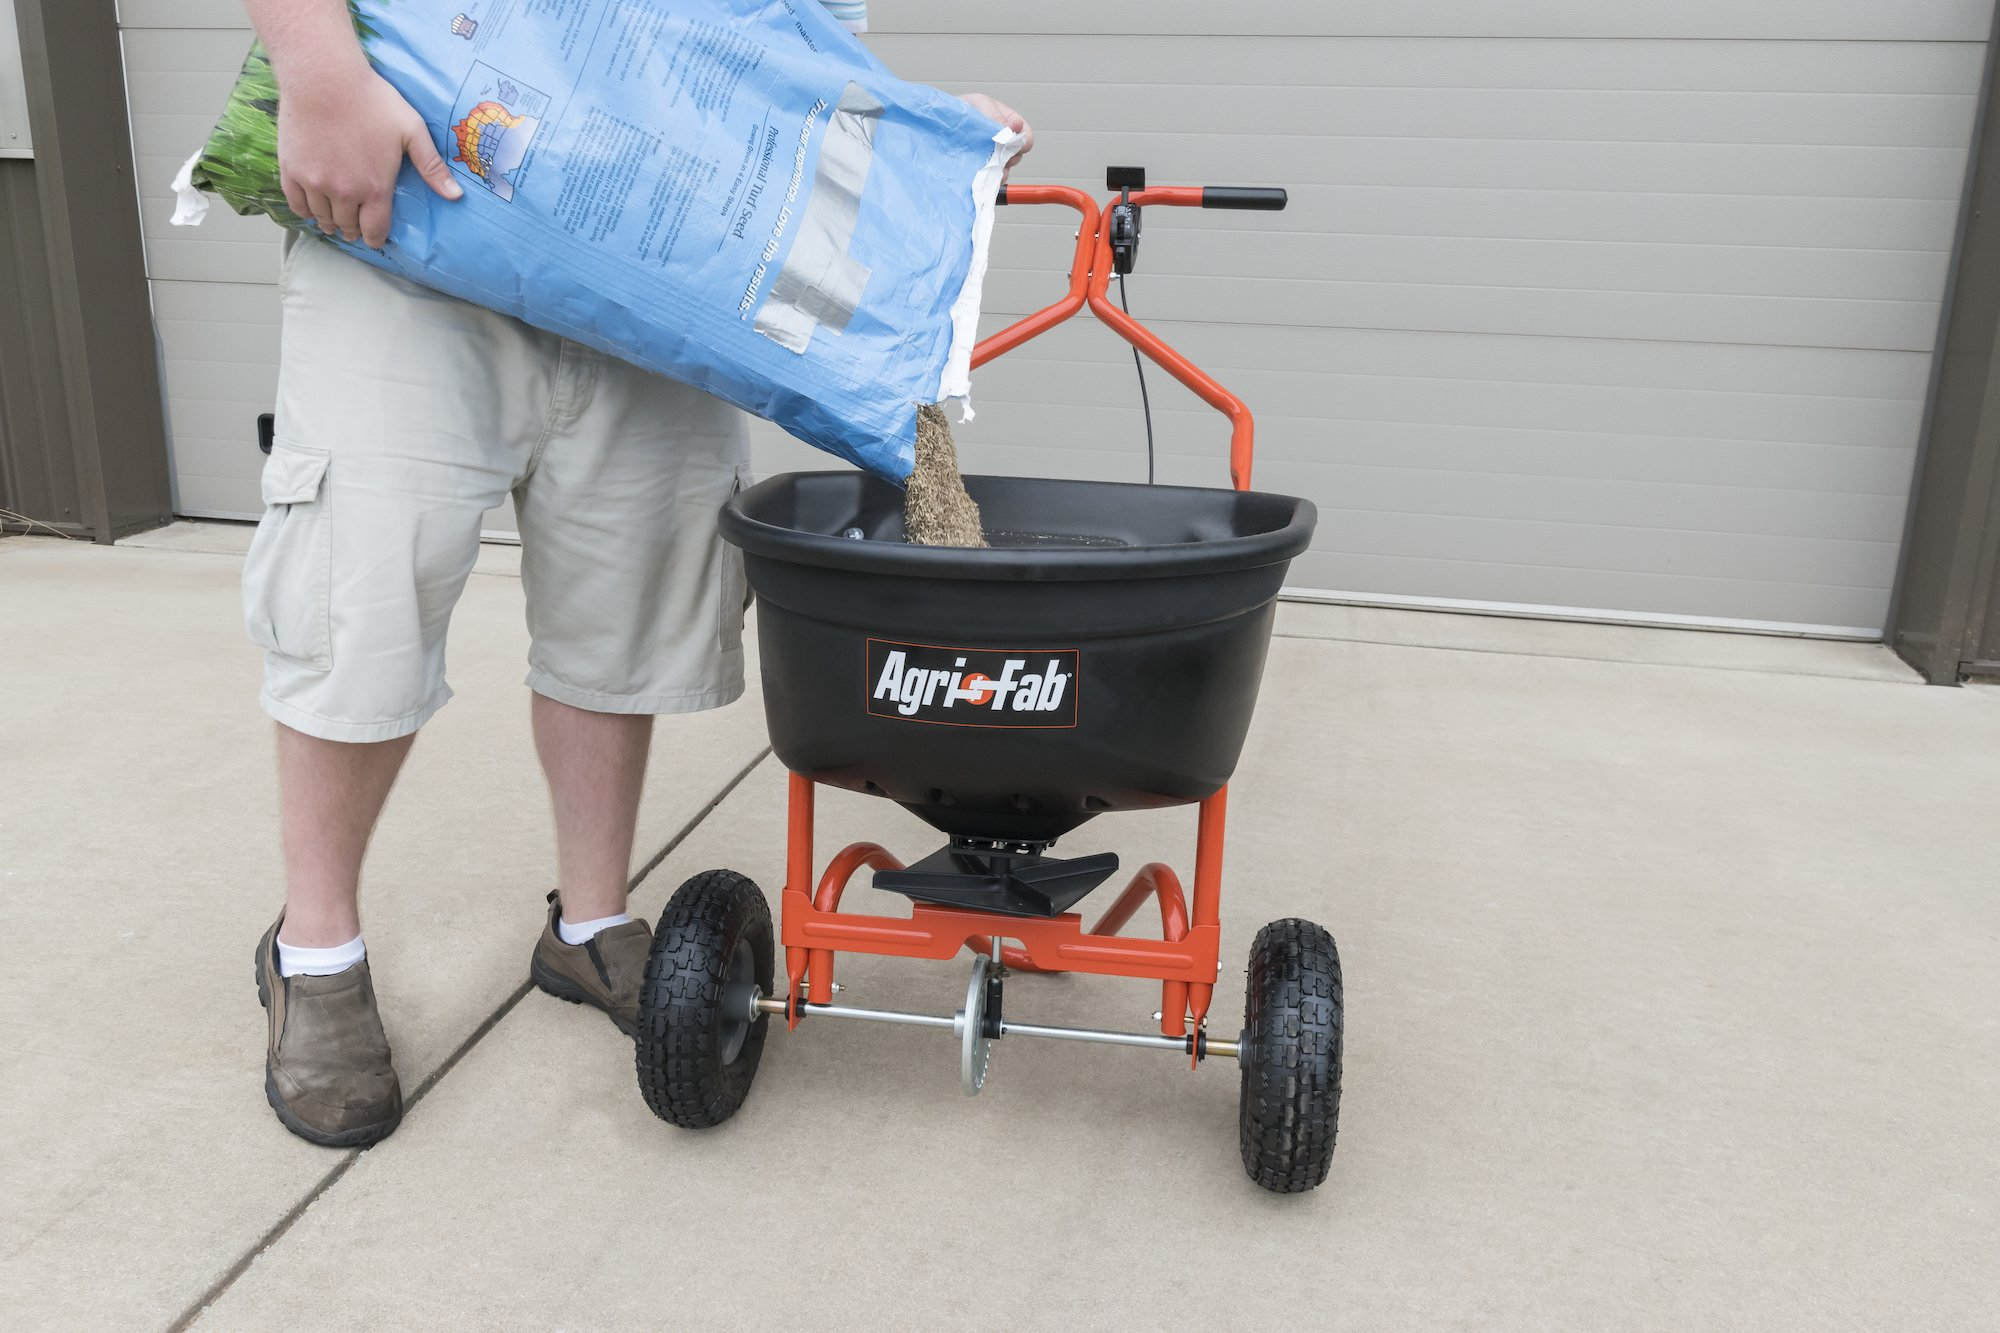 Agri-Fab Broadcast Spreader, 110 lb Capacity, Orange/Black by Agri-Fab